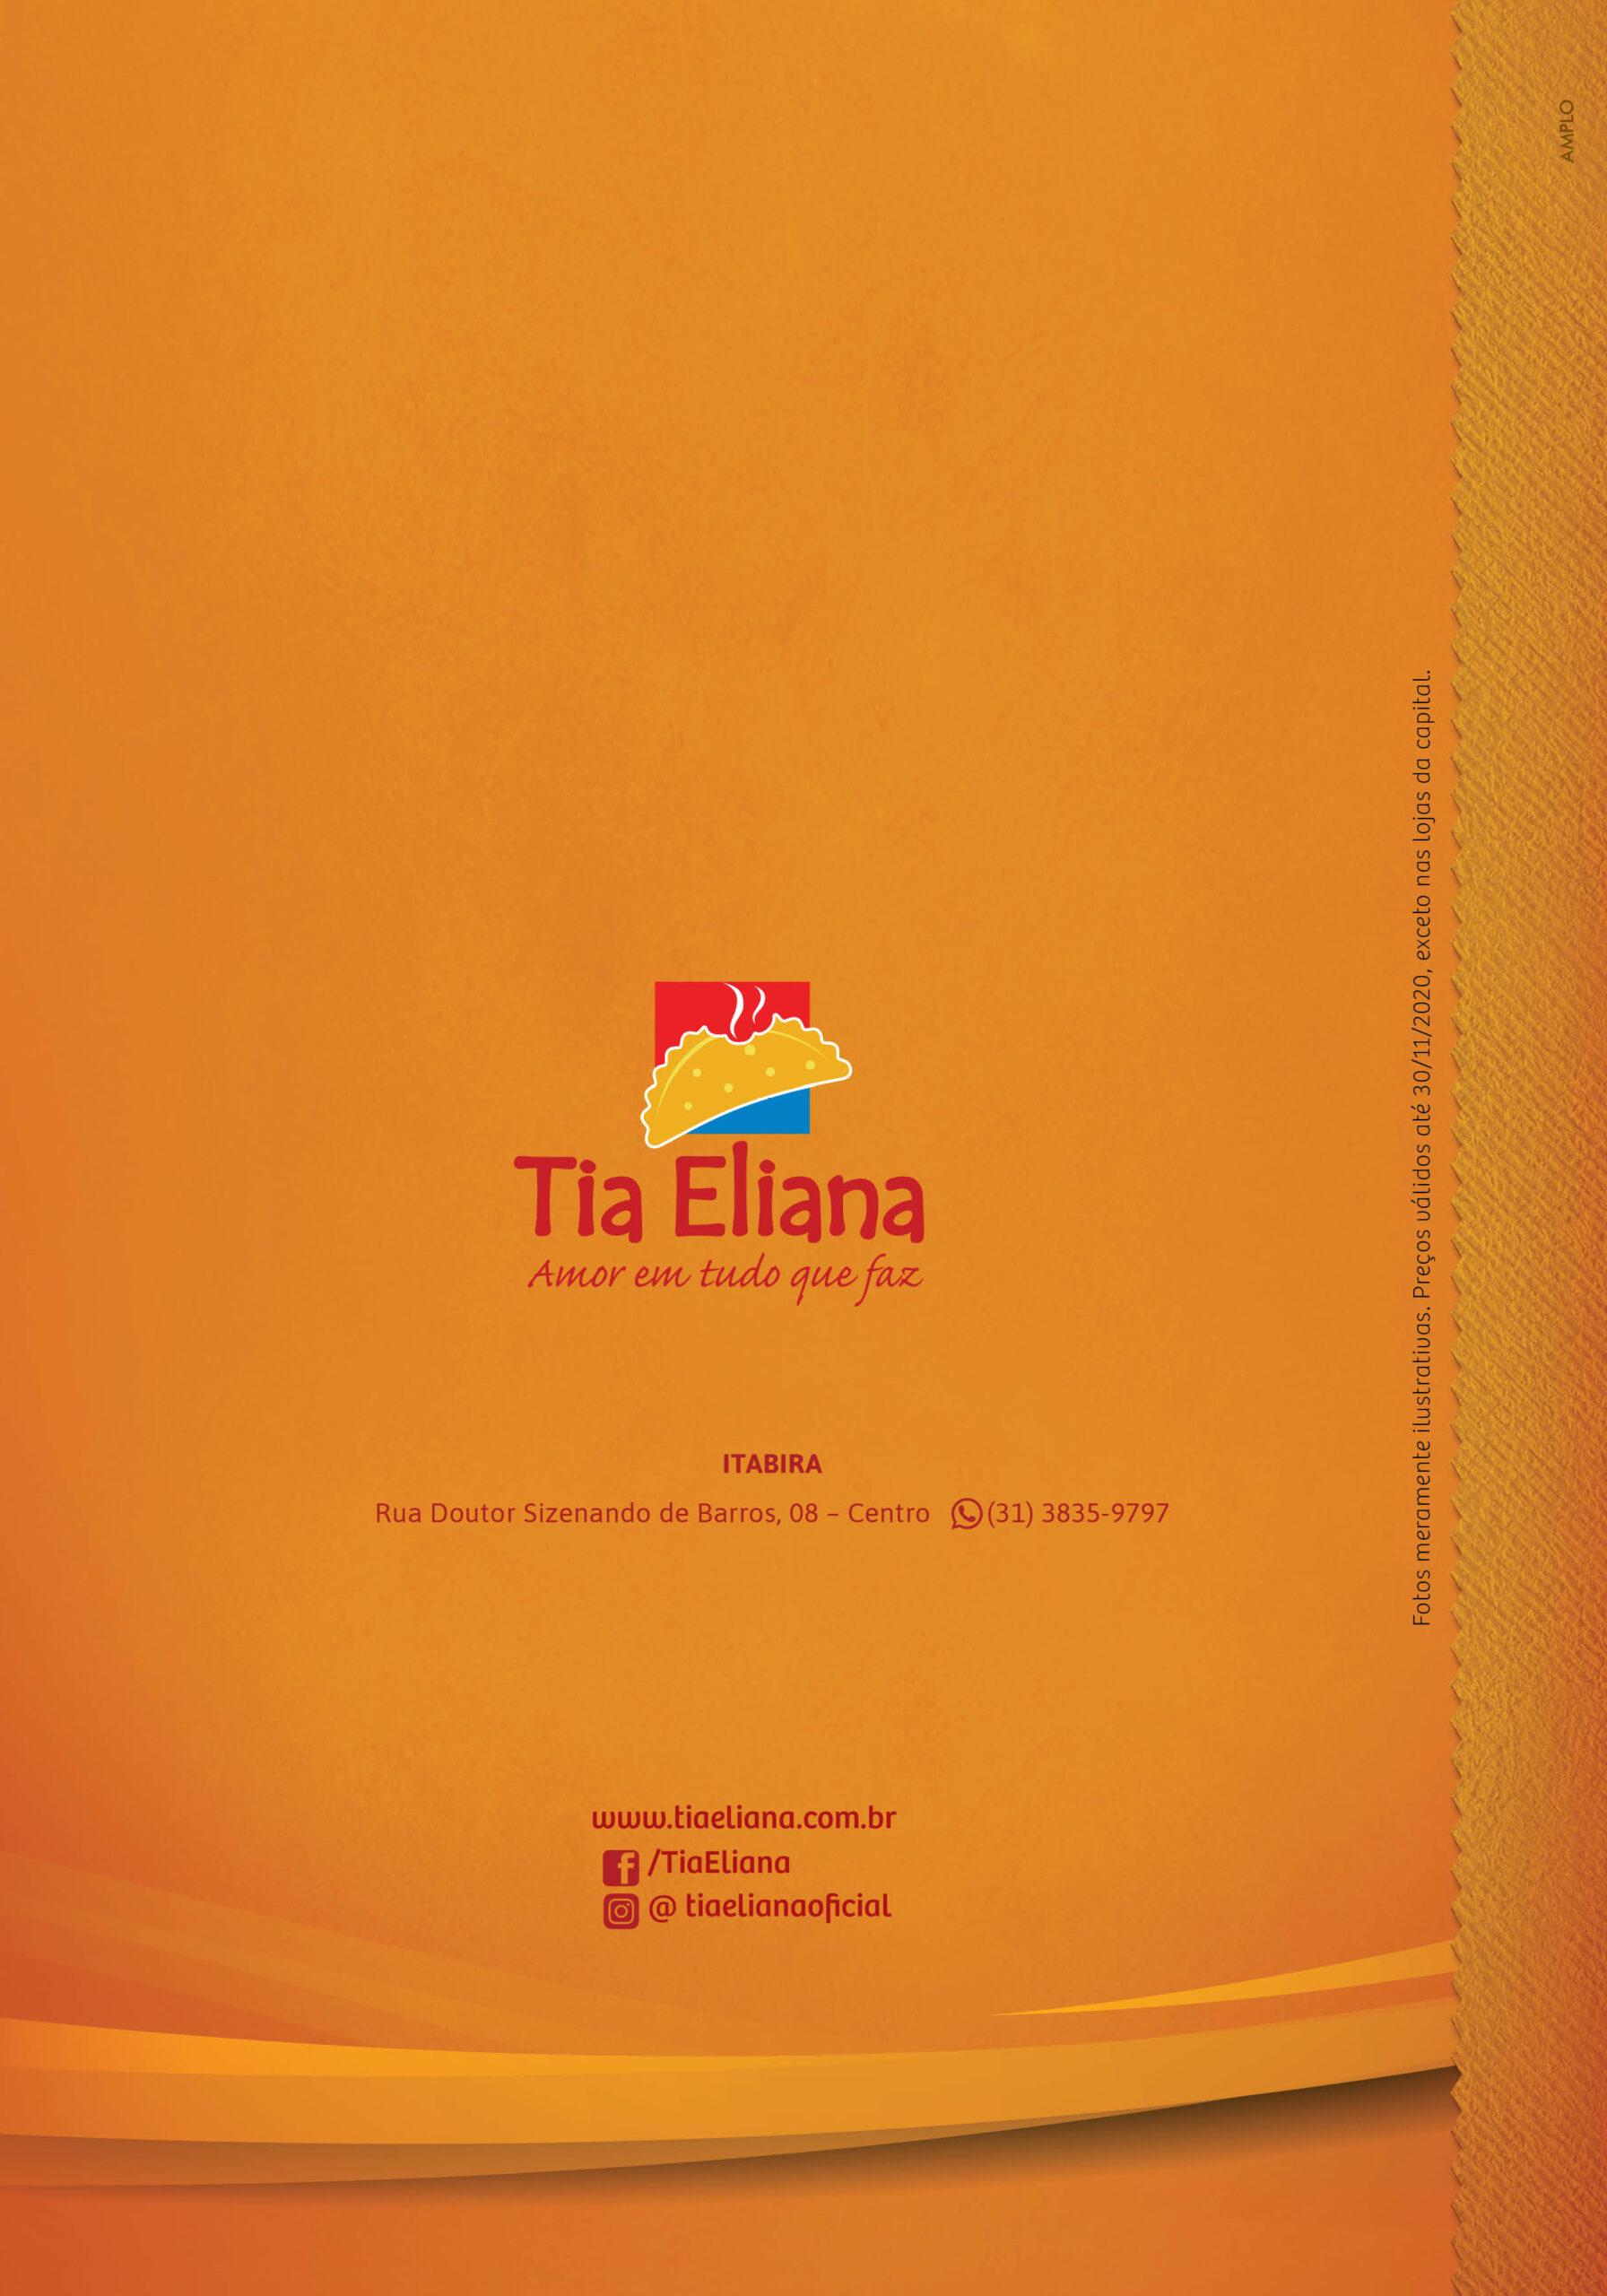 cardapio_completo_interior_a4_2021_tia_eliana_itabira_sp12-1-scaled Itabira - Sizenando Barros